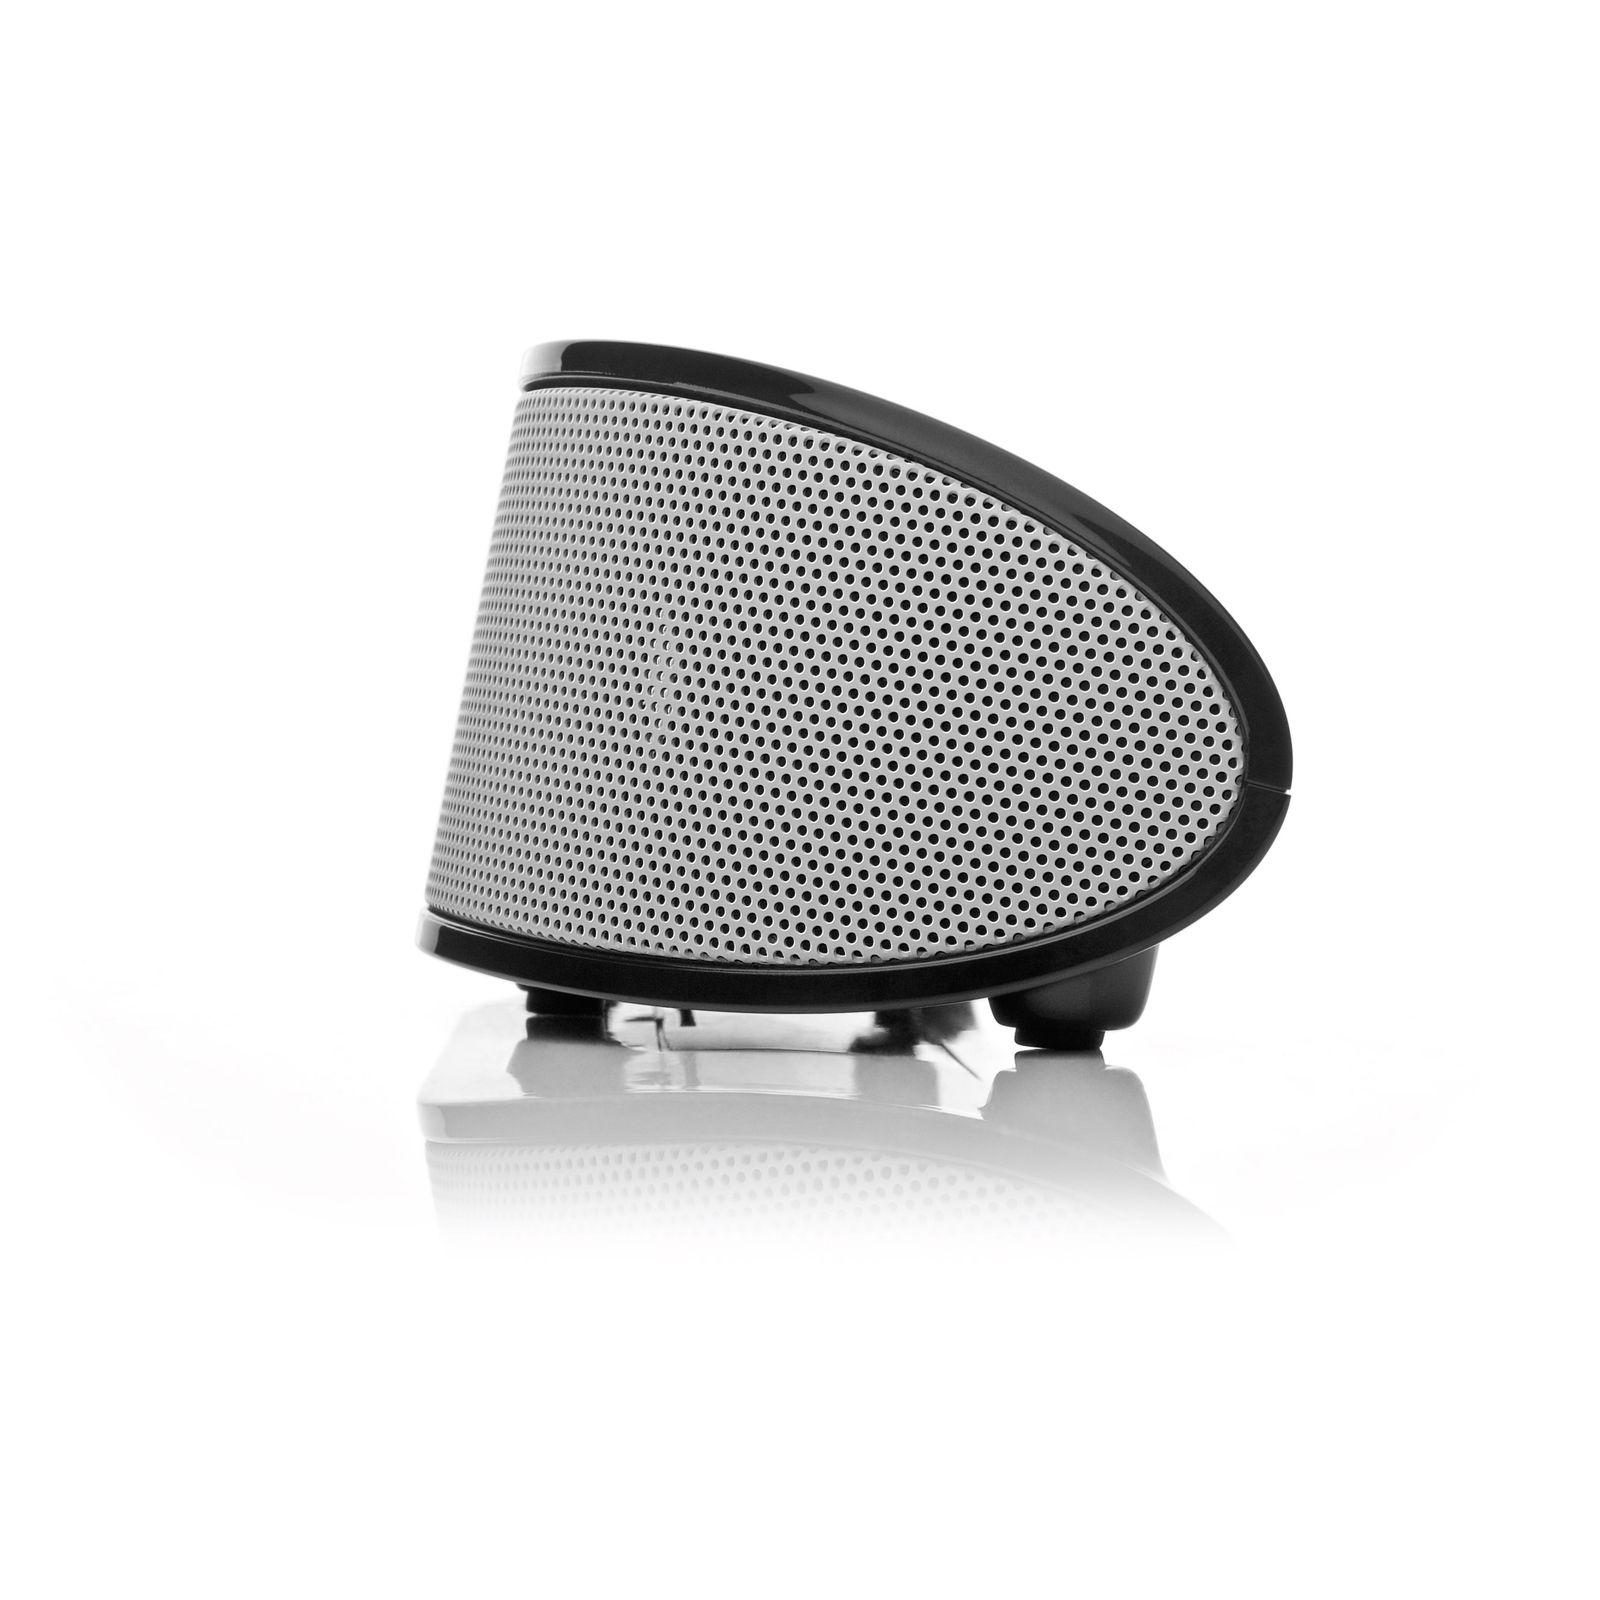 soundbar lautsprecher boxen audio soundsystem mit. Black Bedroom Furniture Sets. Home Design Ideas